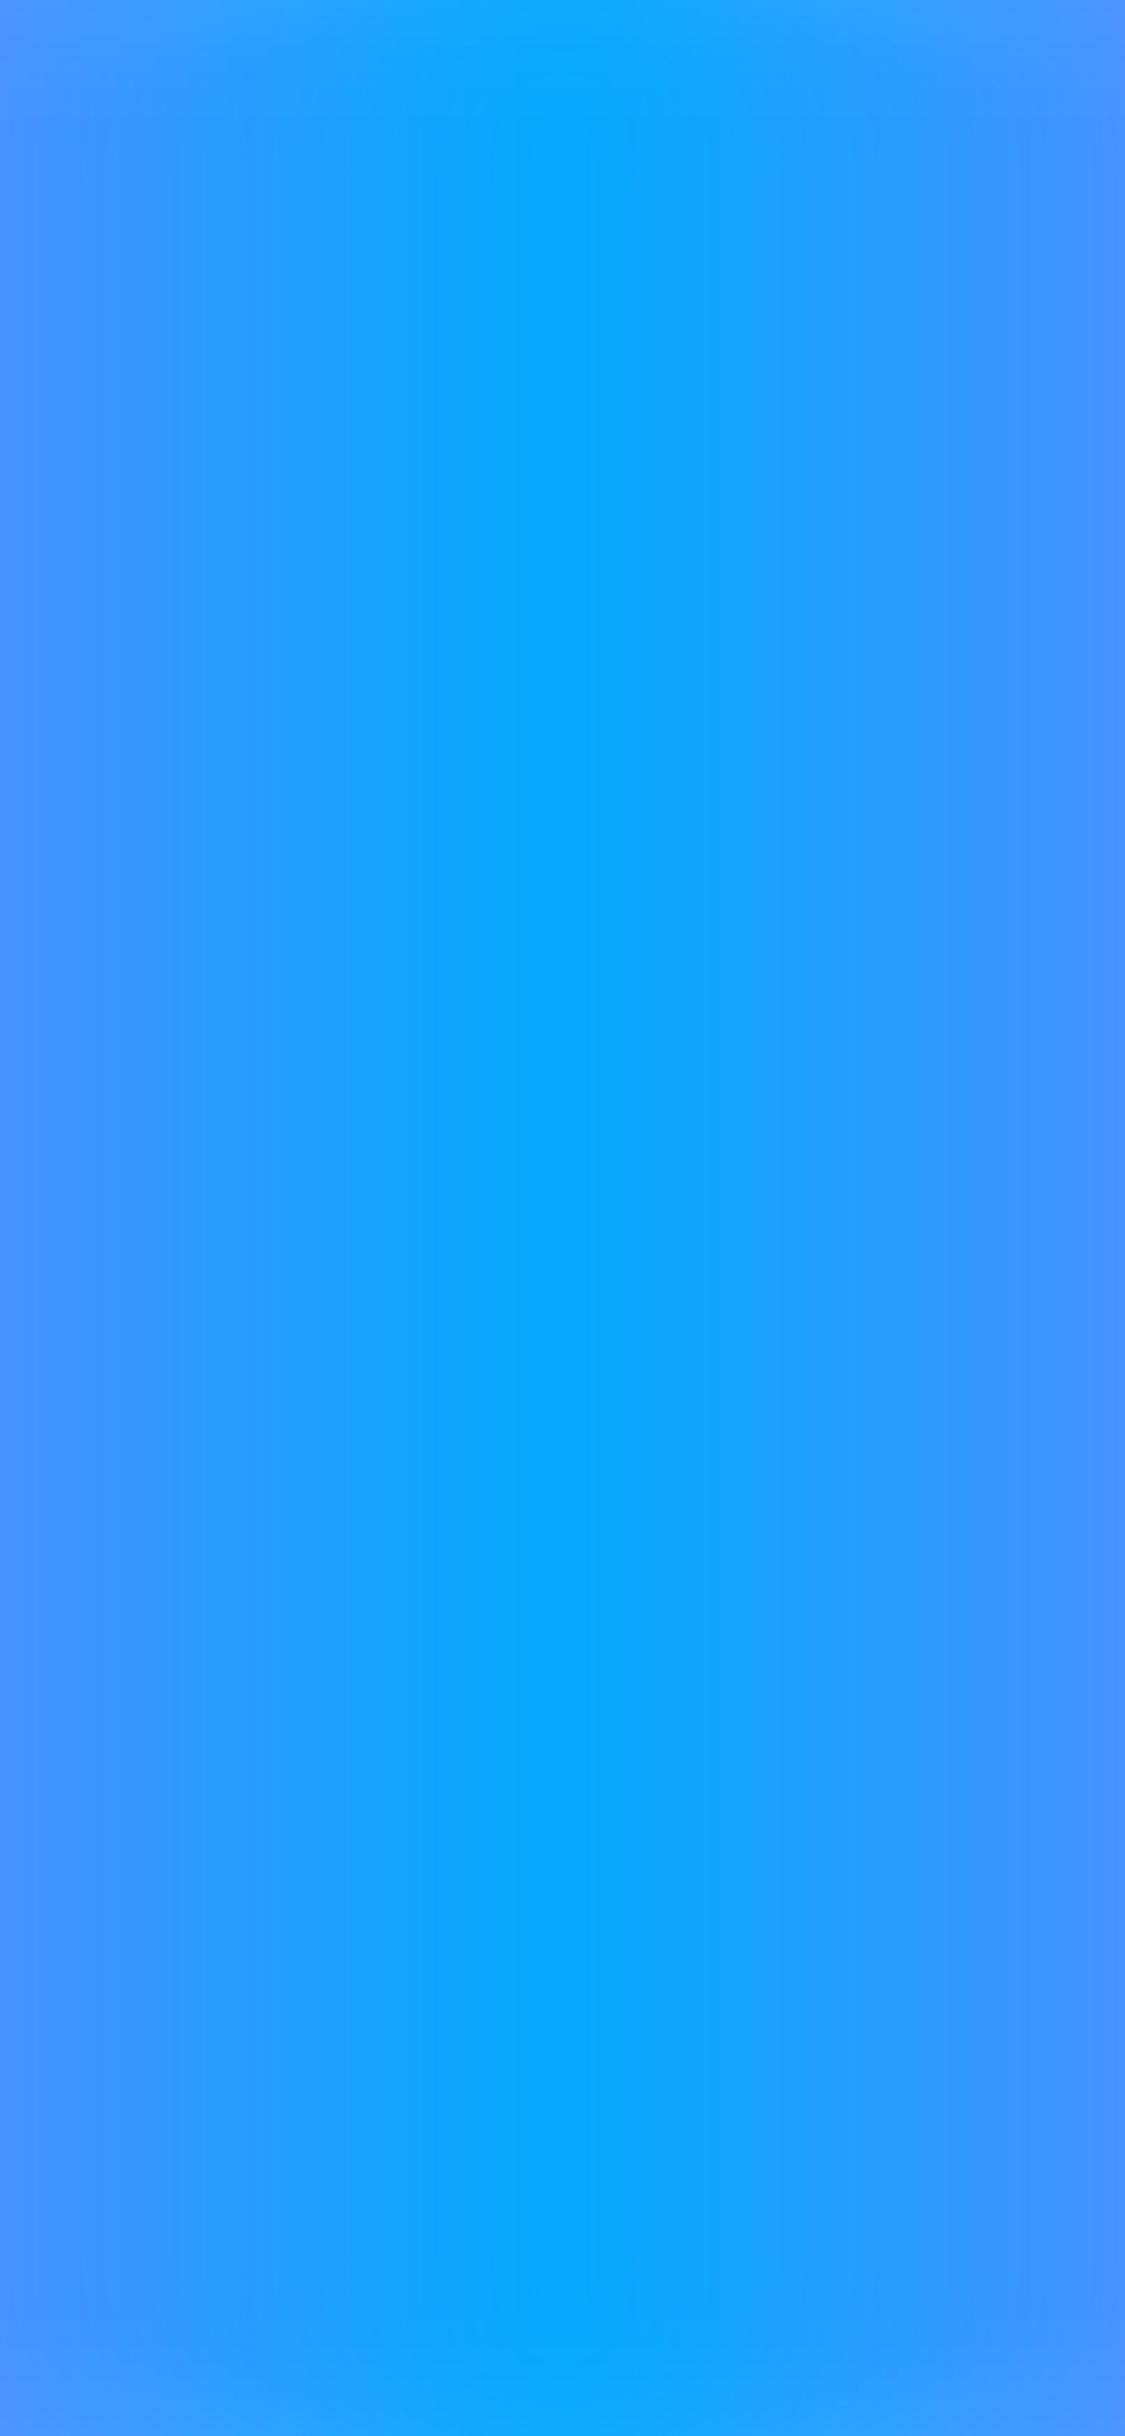 Iphonexpapers Sd16 Los Angeles Bixel St Blur Gradient